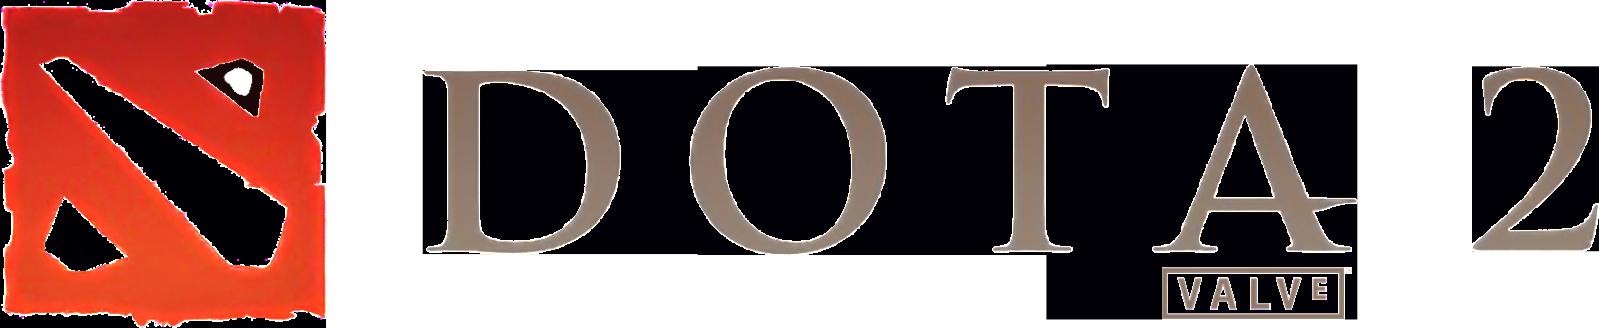 image - logo dota 2 | the amazing world of gumball wiki